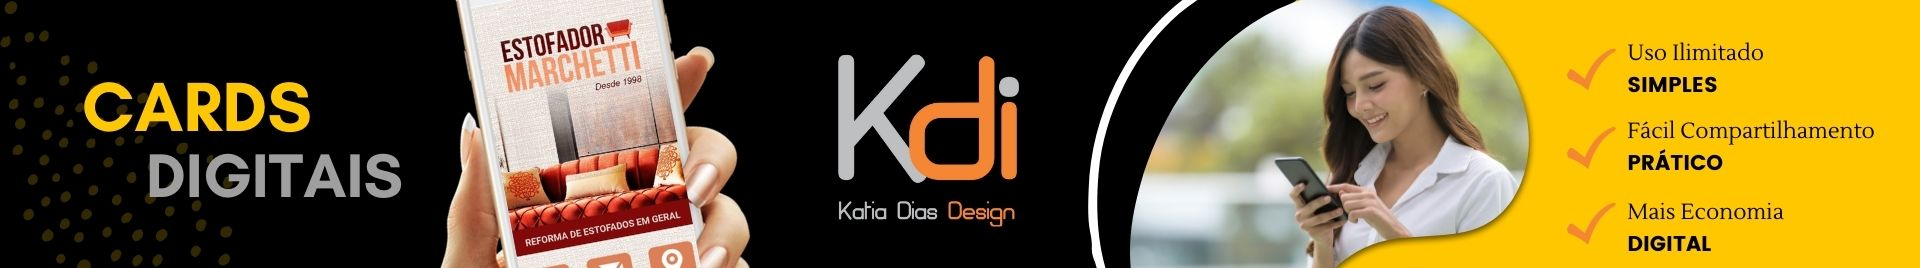 Basicato